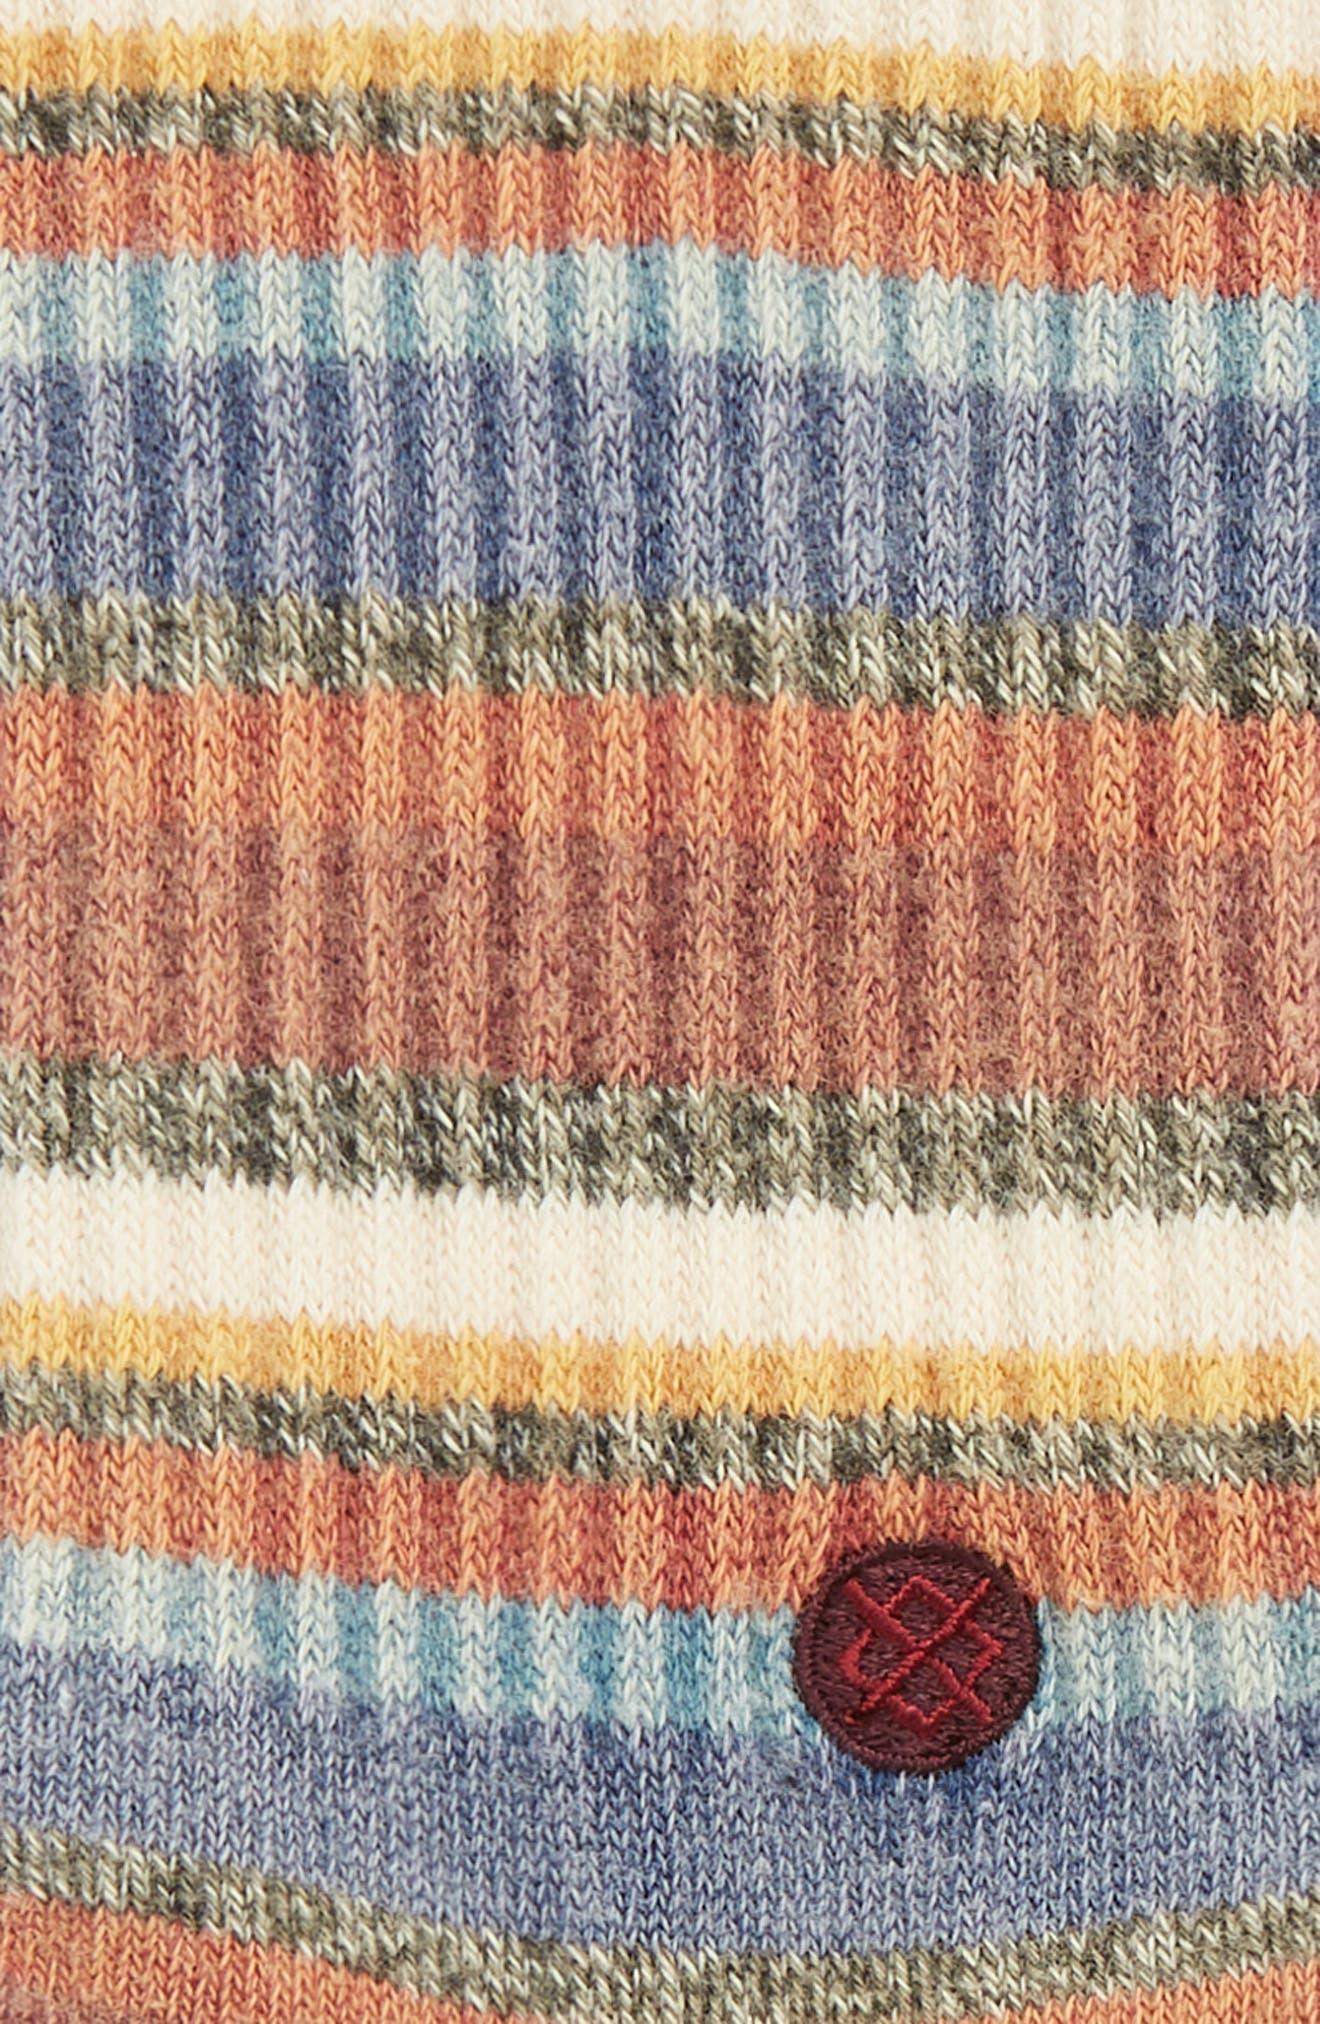 Riot Striped Socks,                             Alternate thumbnail 2, color,                             601